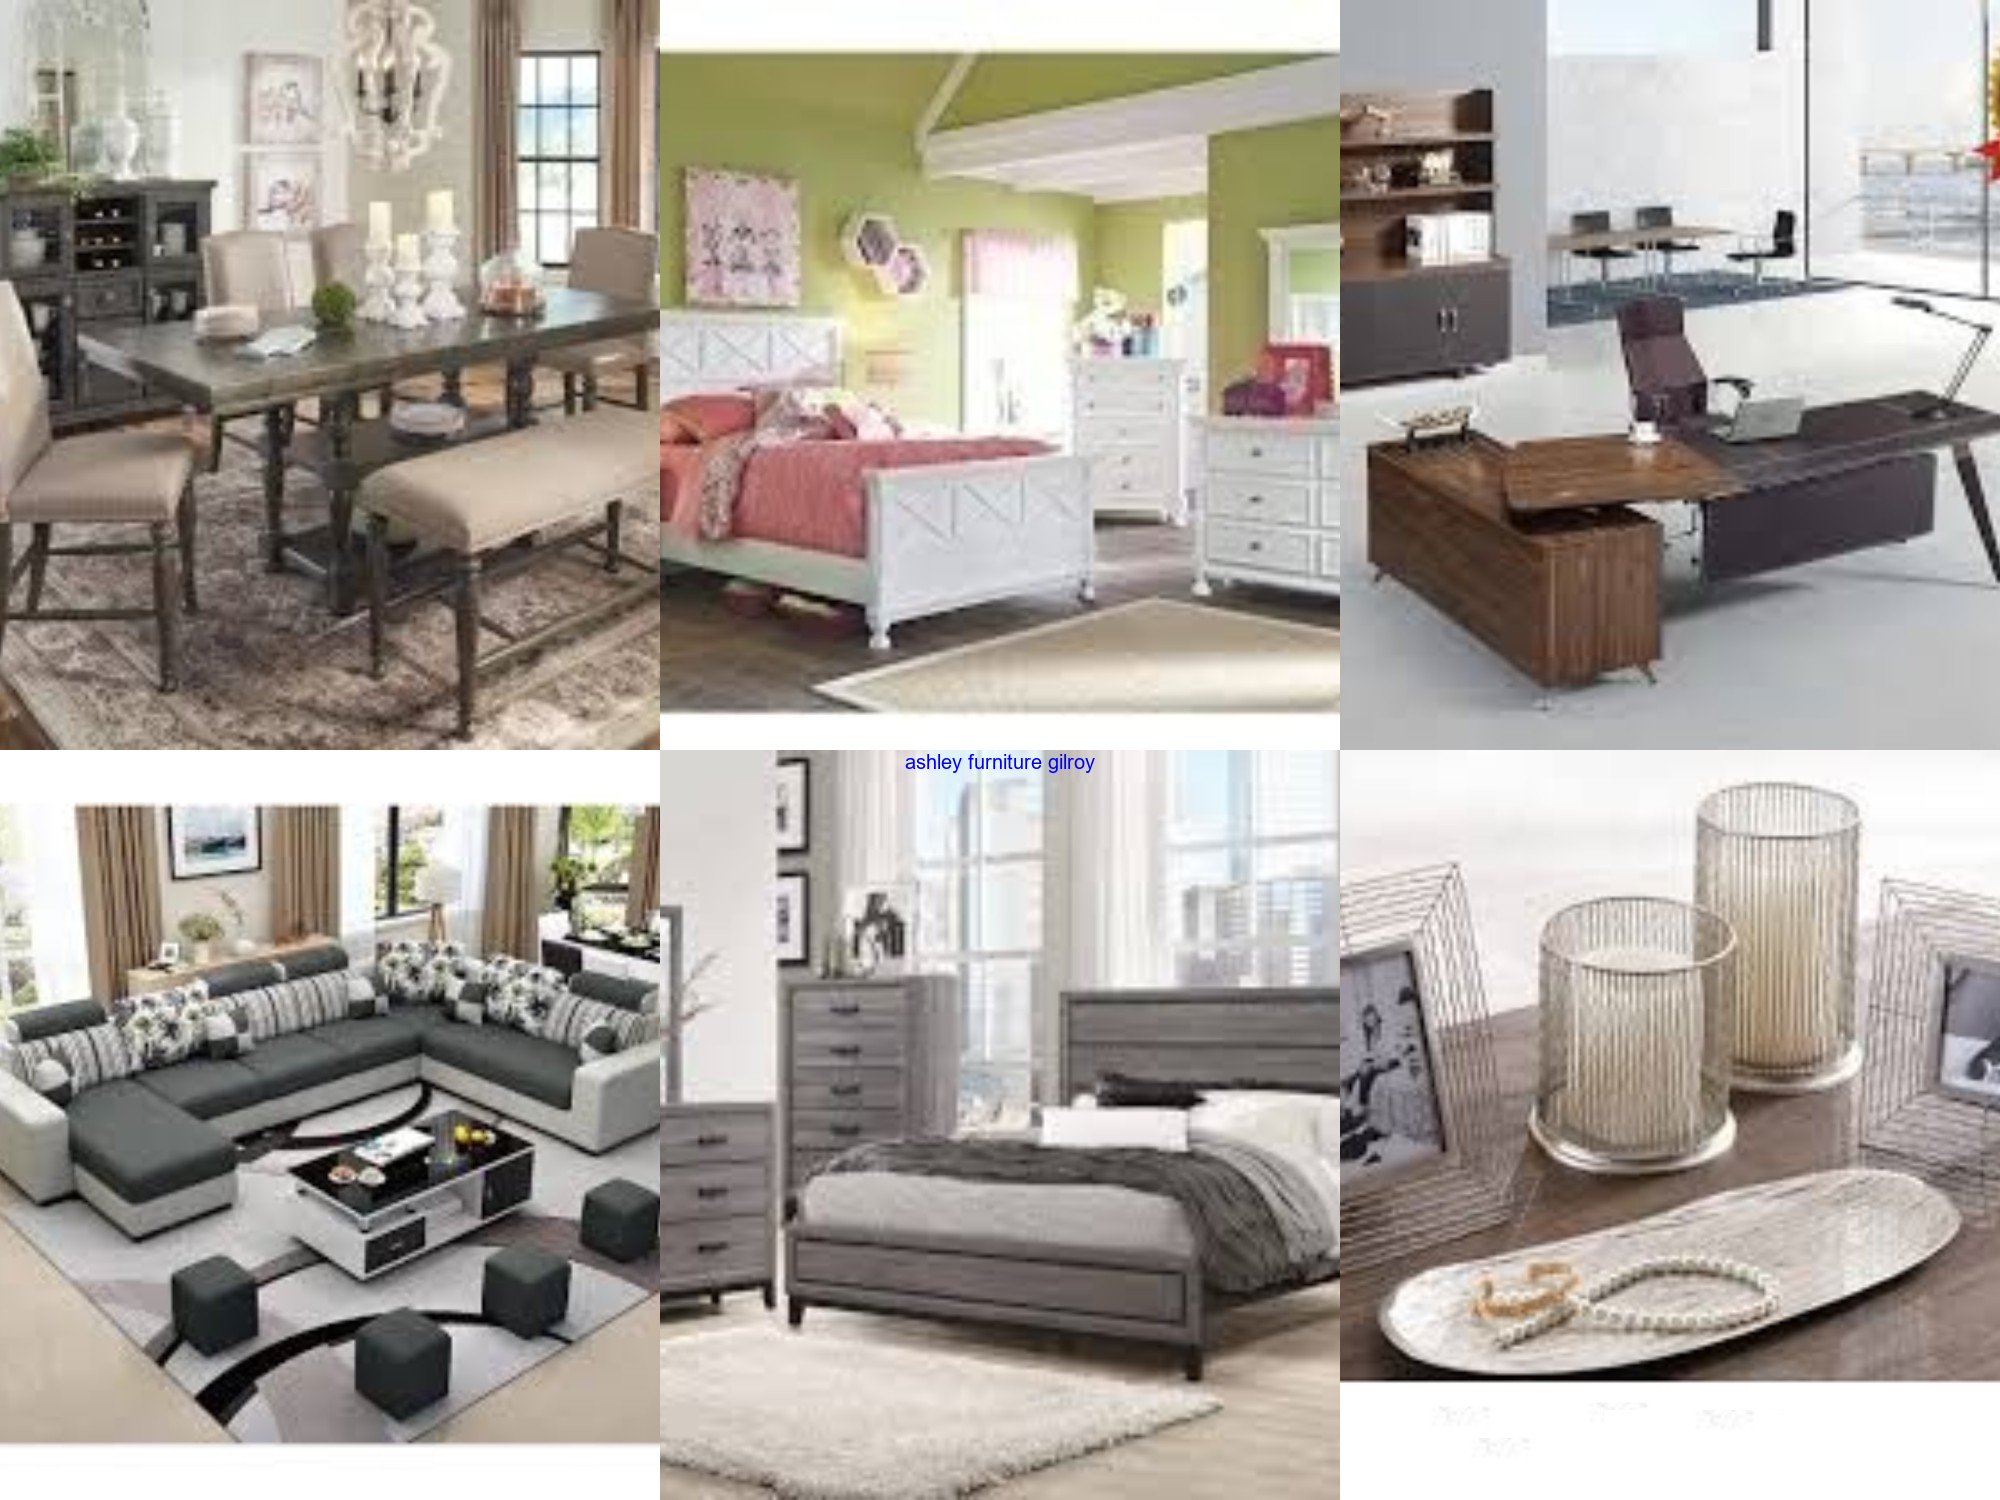 Ashley Furniture Gilroy Furniture Prices Furniture Reviews Furniture